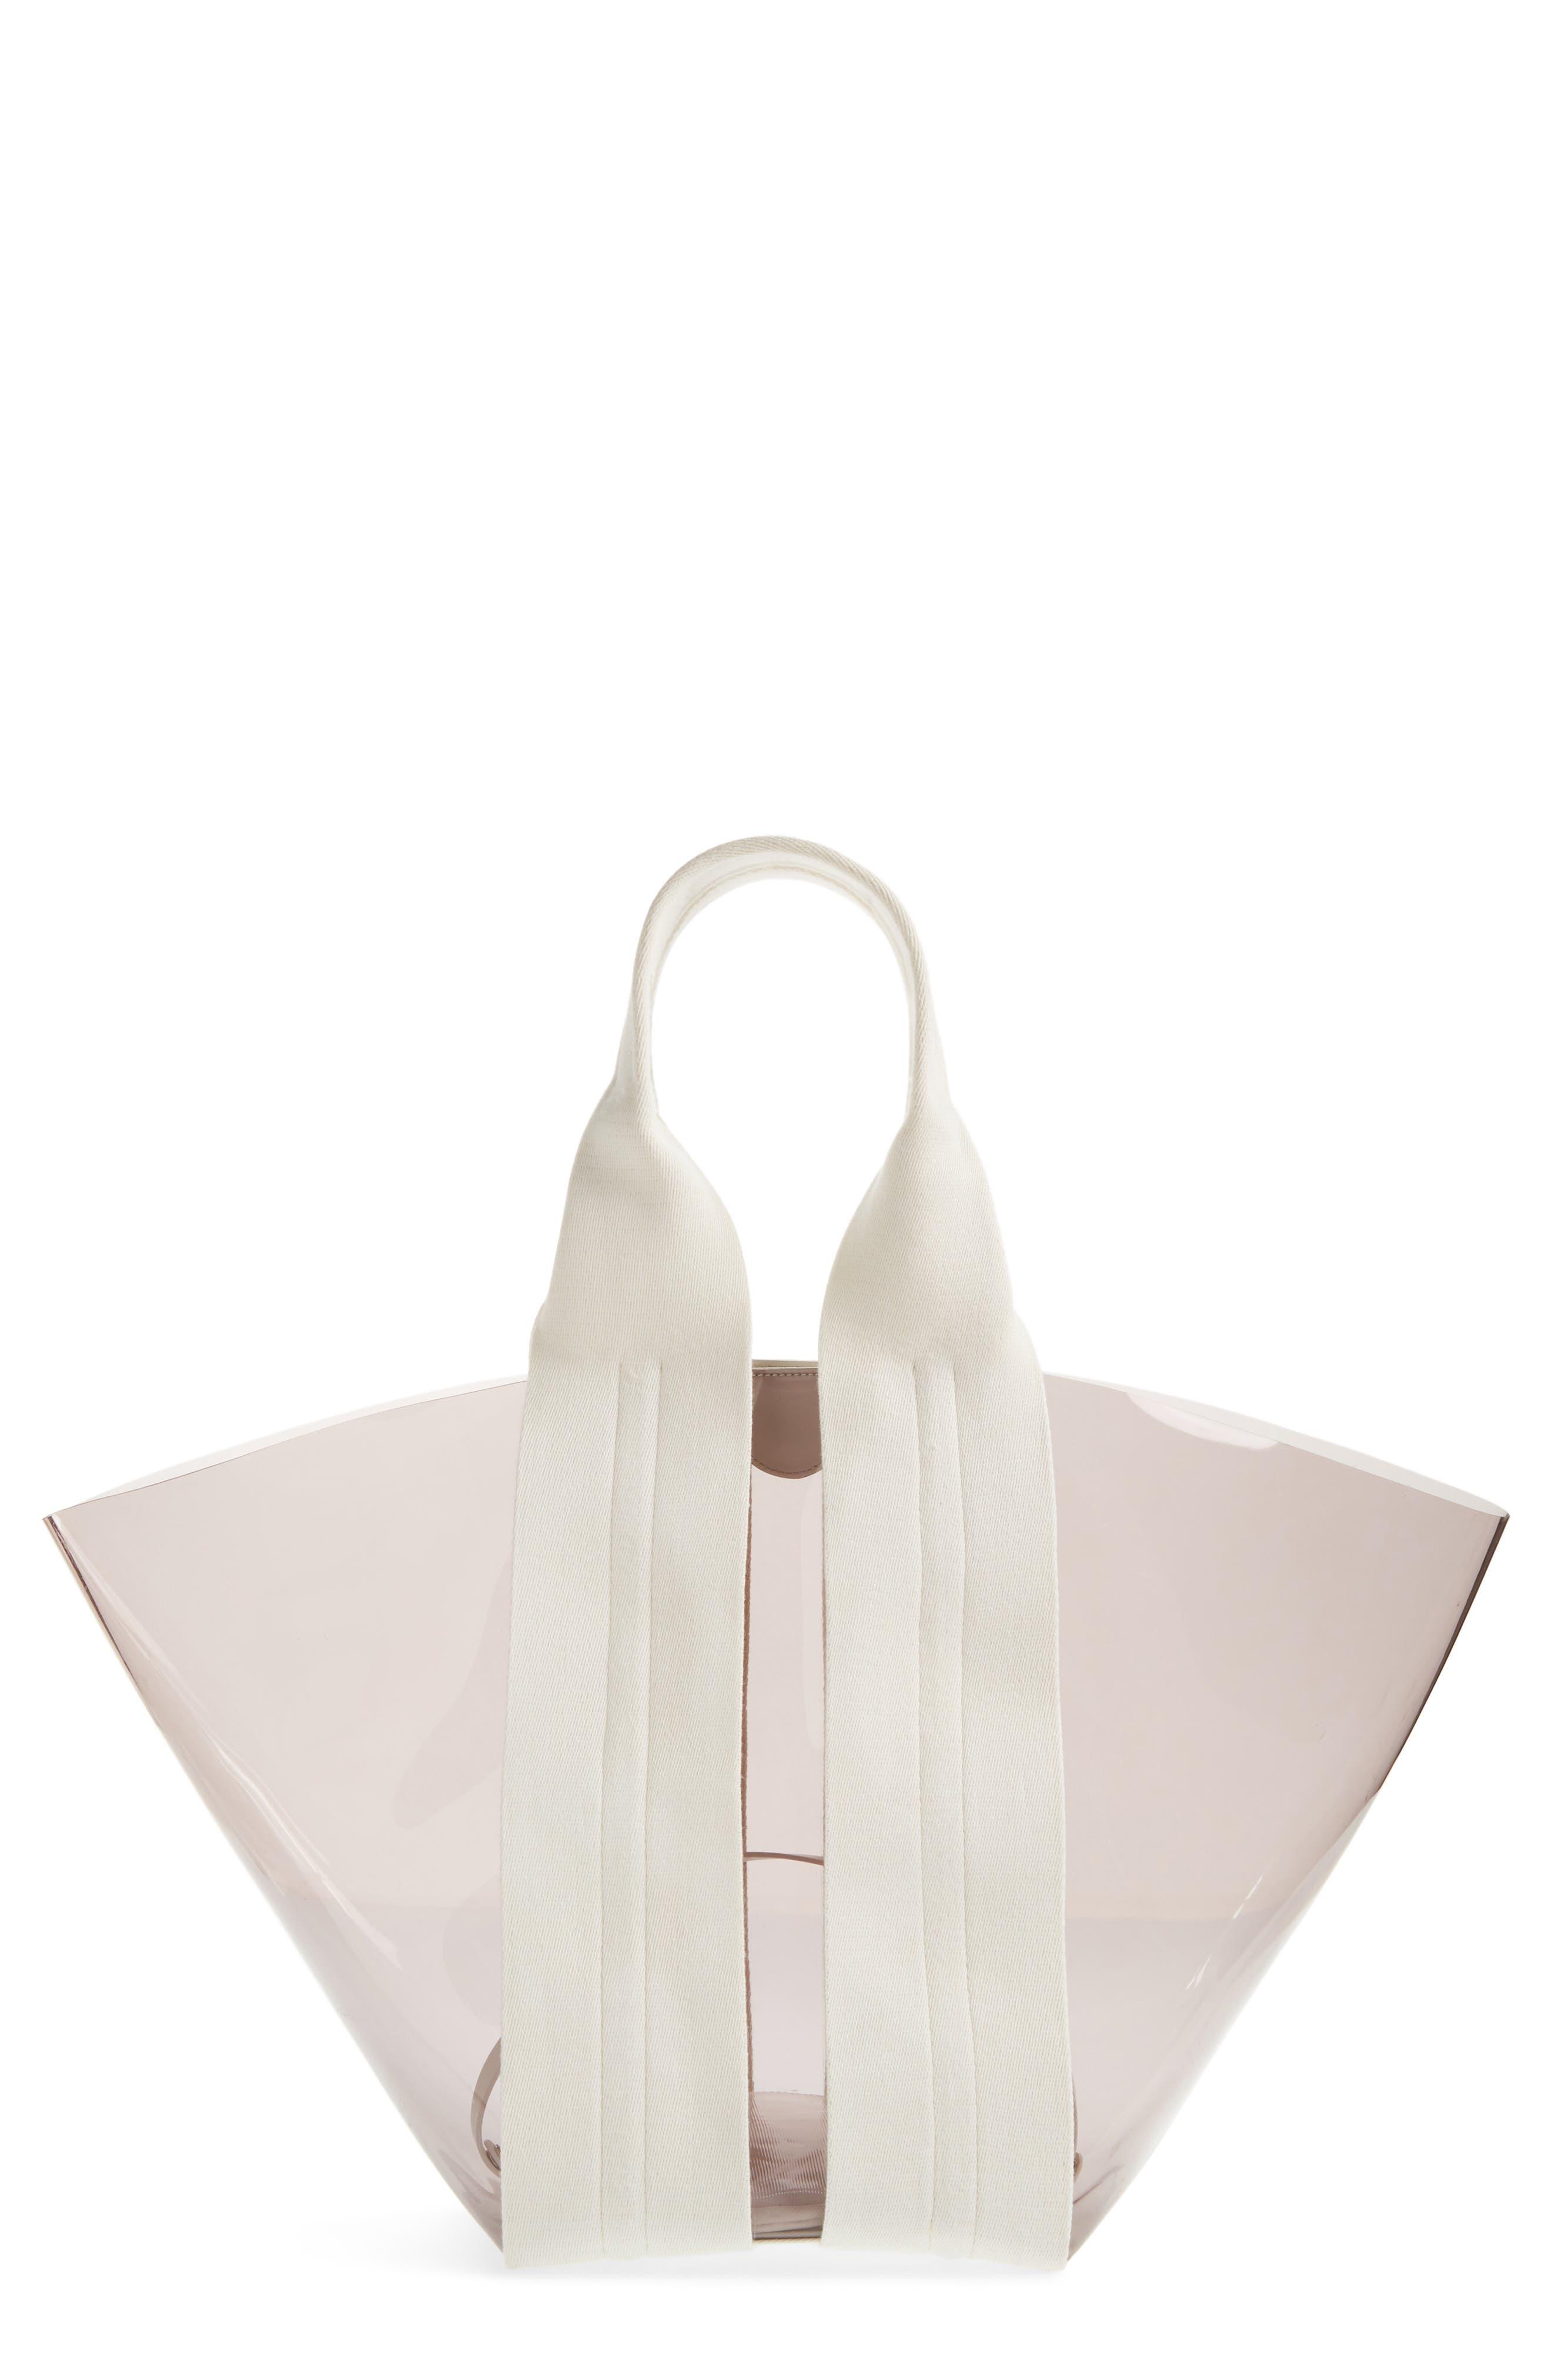 Image of Rebecca Minkoff Fan Clear PVC Tote Bag